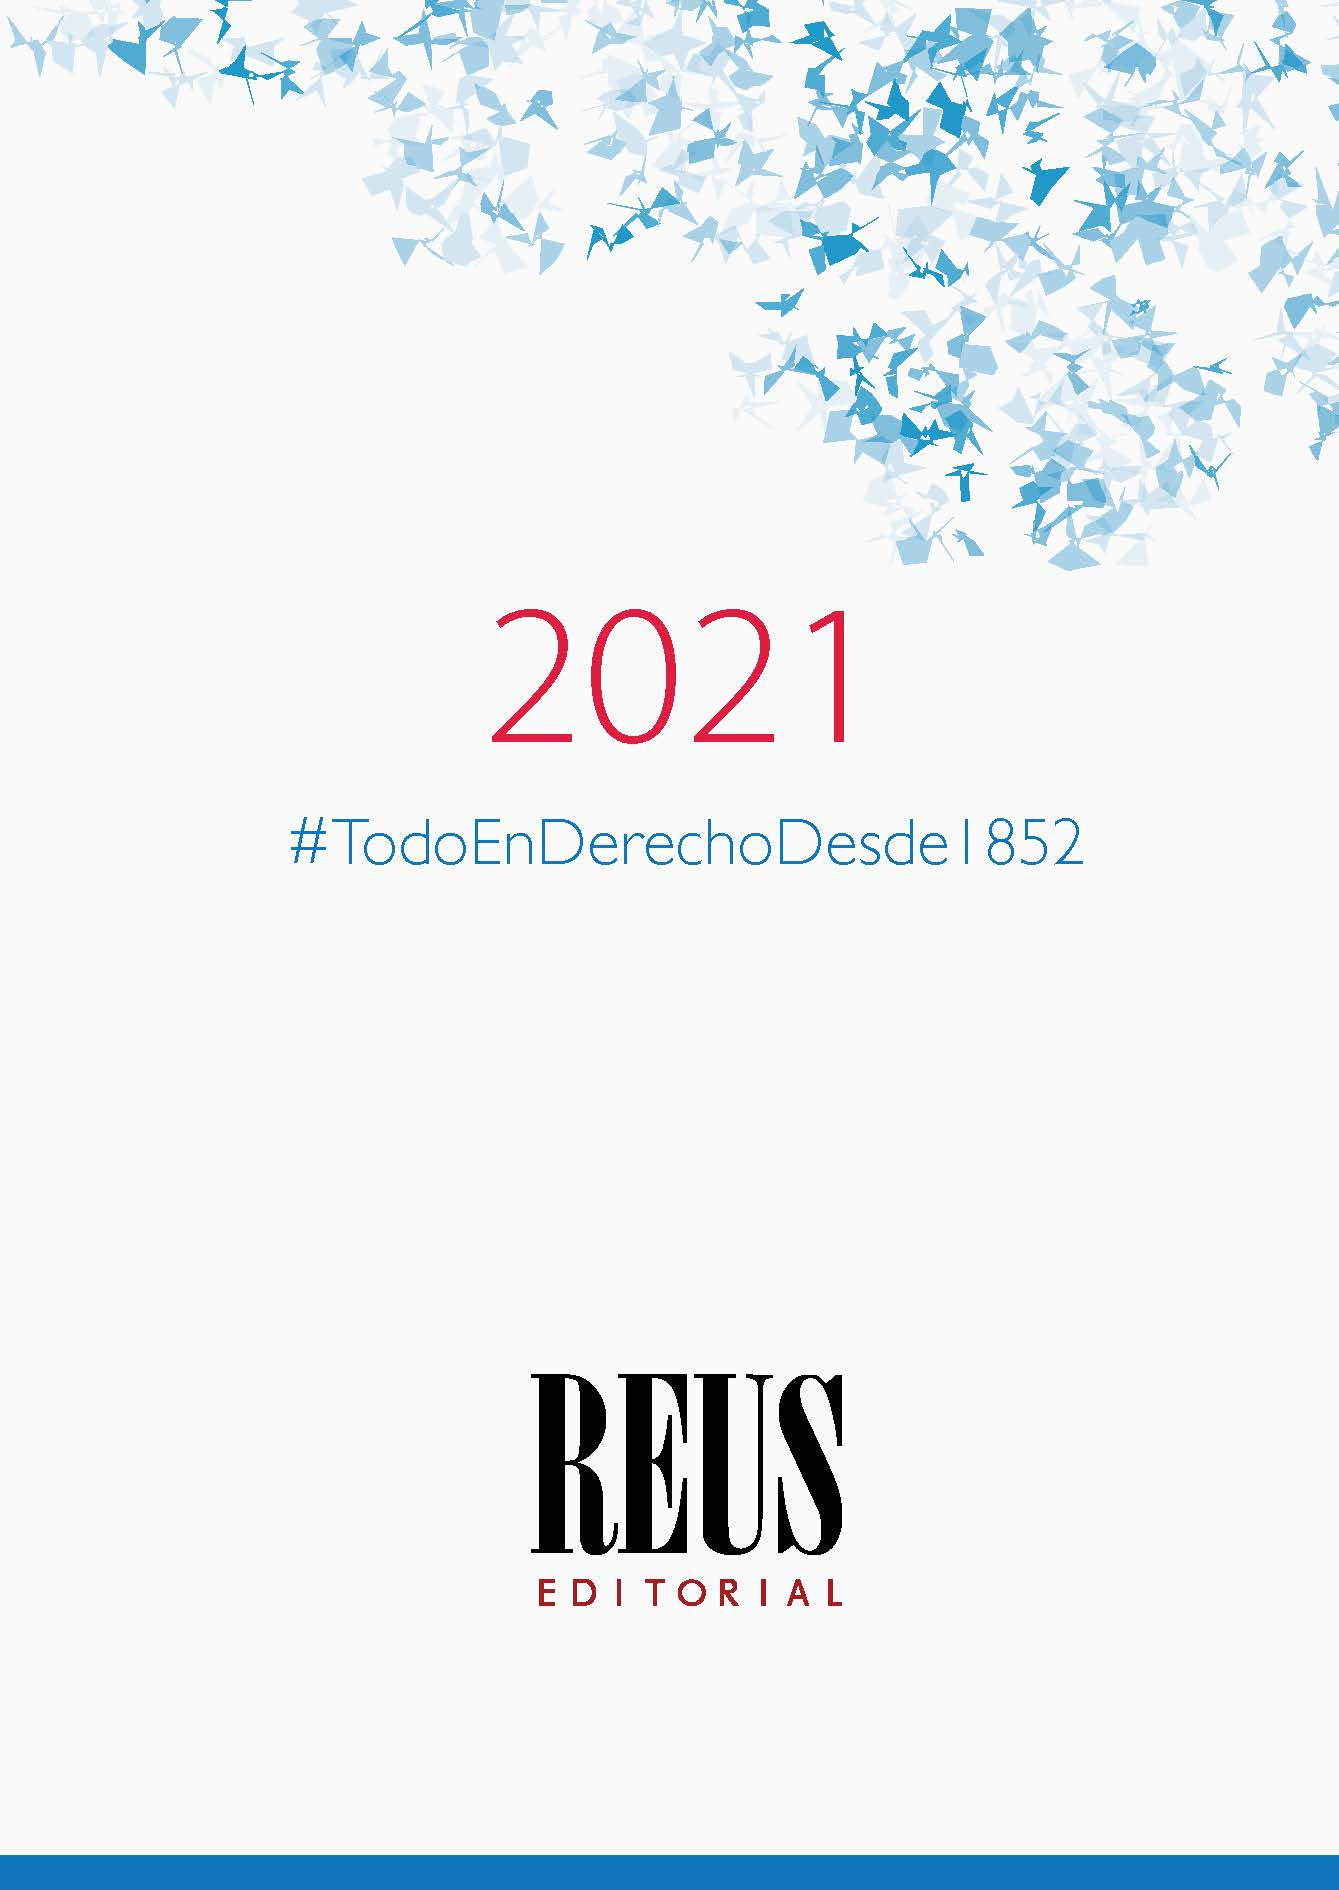 Cover_catalogo_editorial_reus_2021